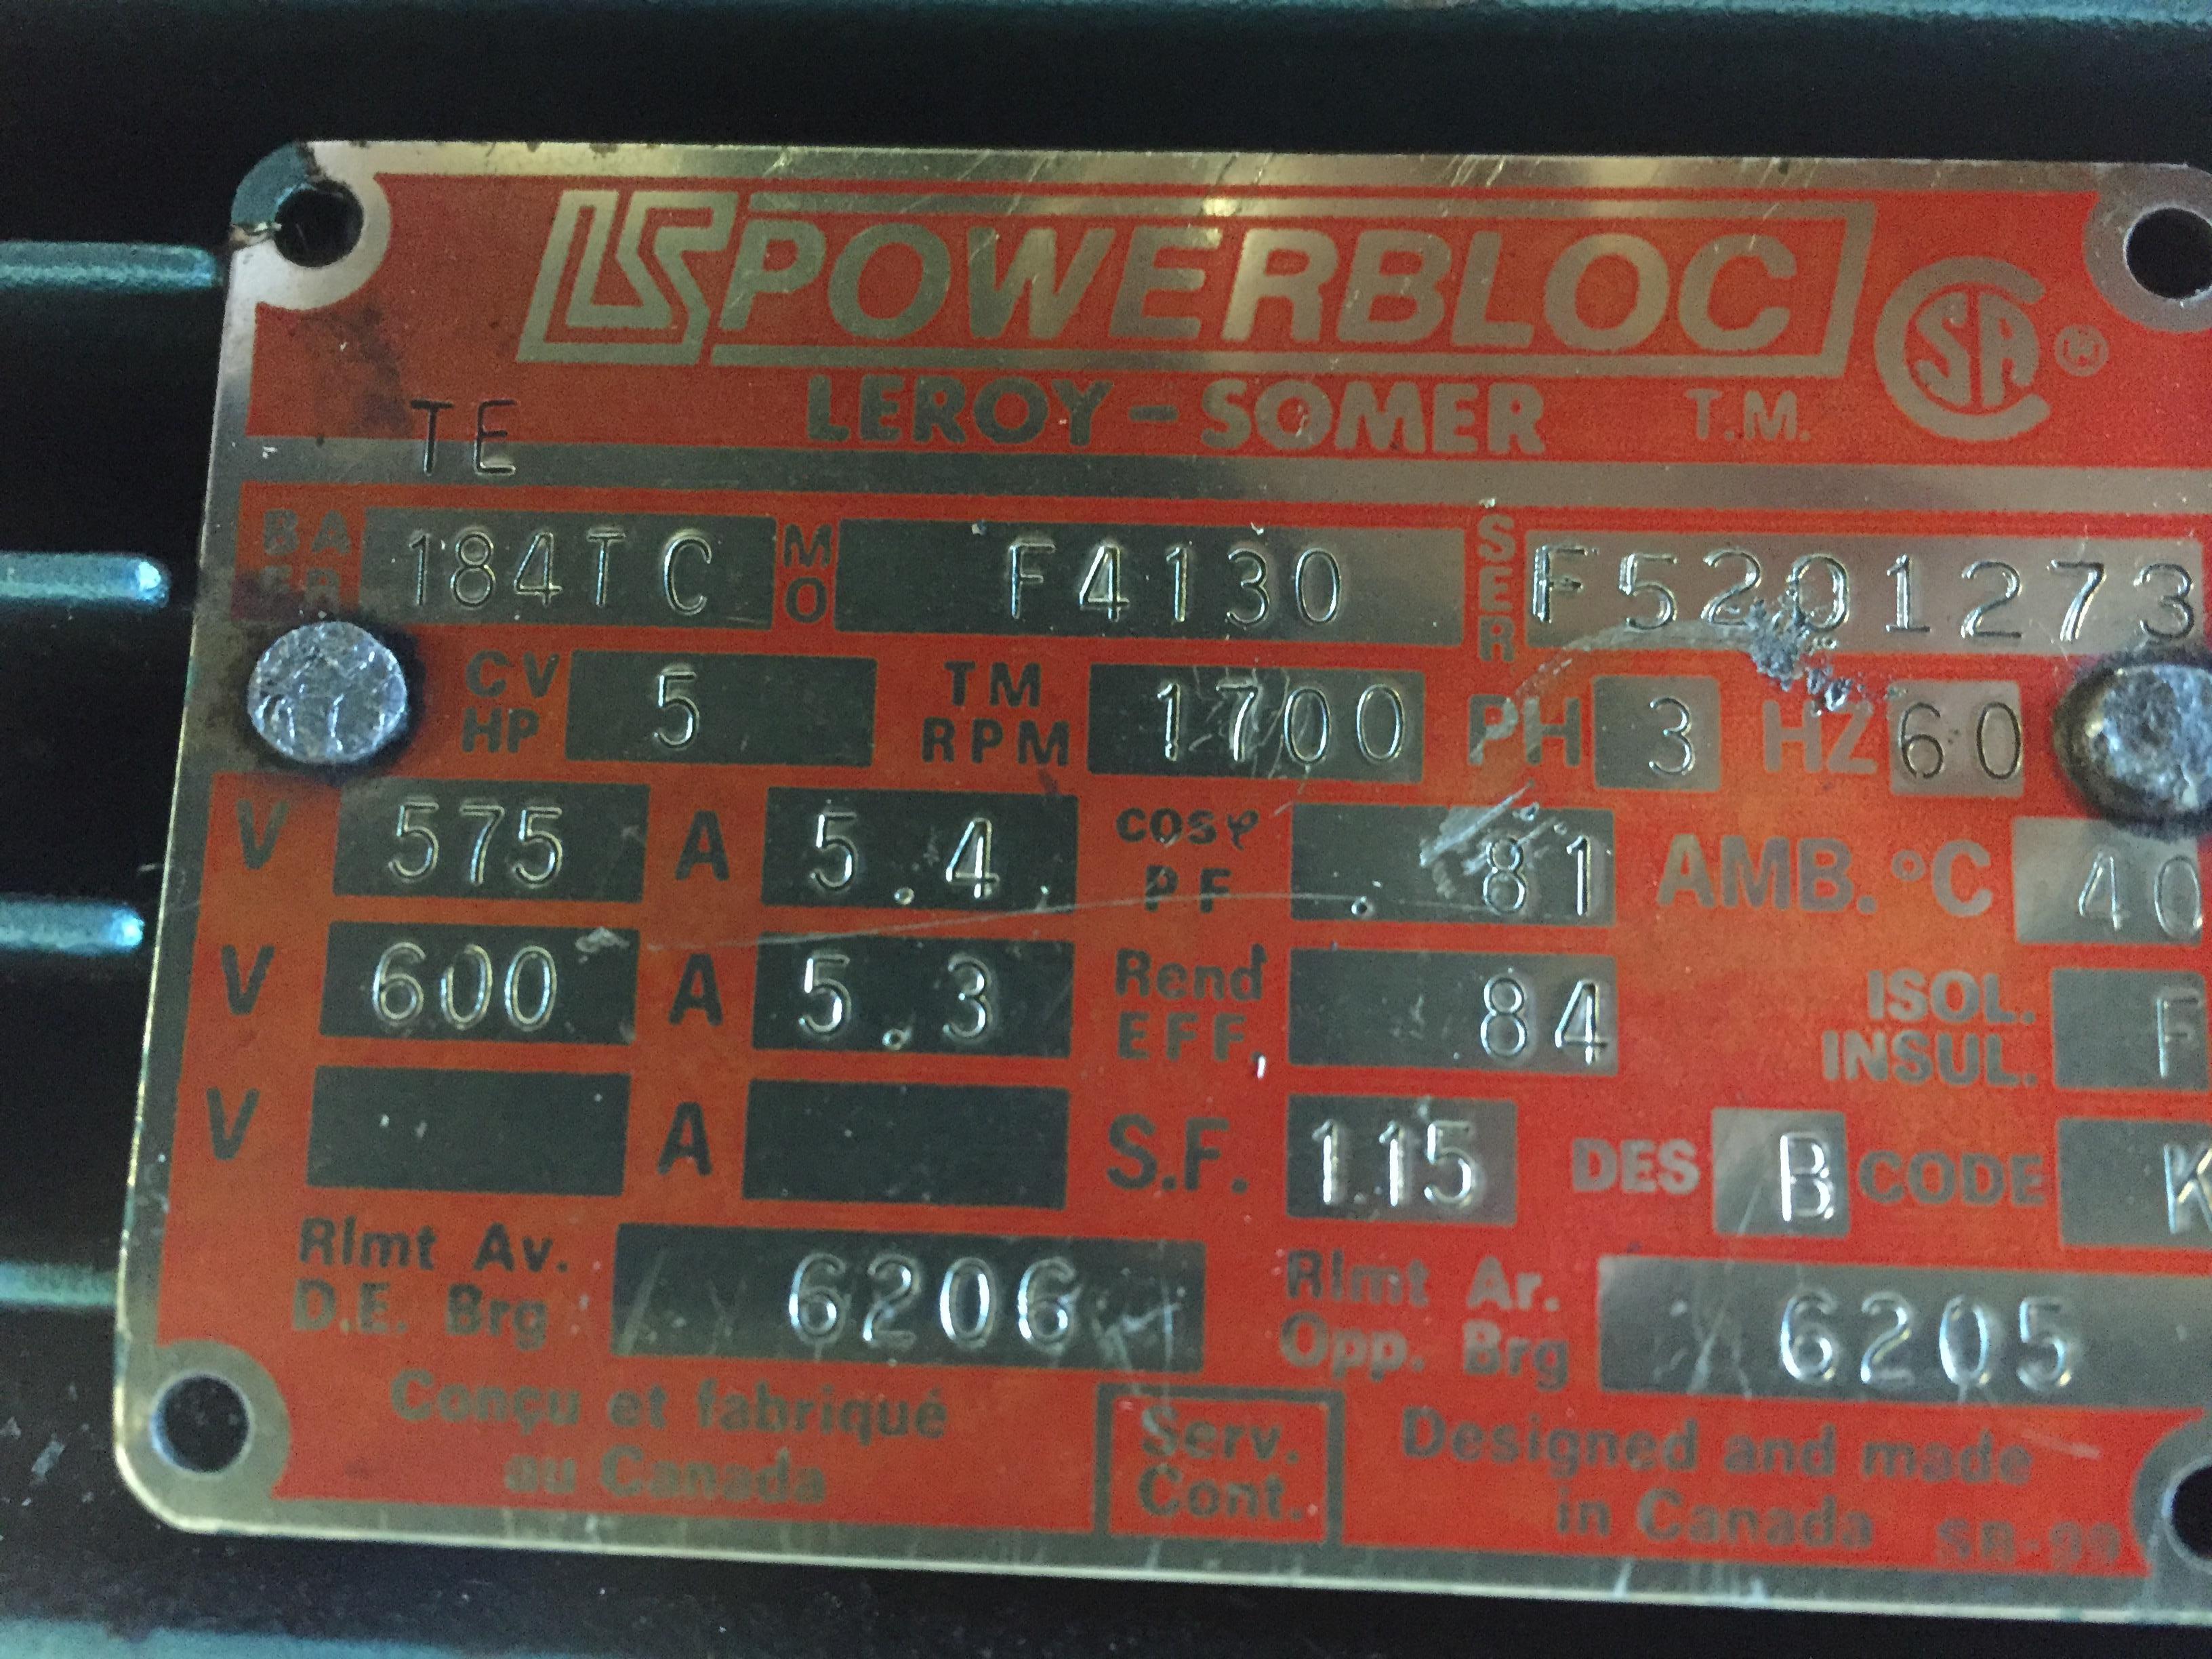 LS POWERBLOC PUMP, MODEL #F4130, SERIAL #F5201273 - Image 3 of 3